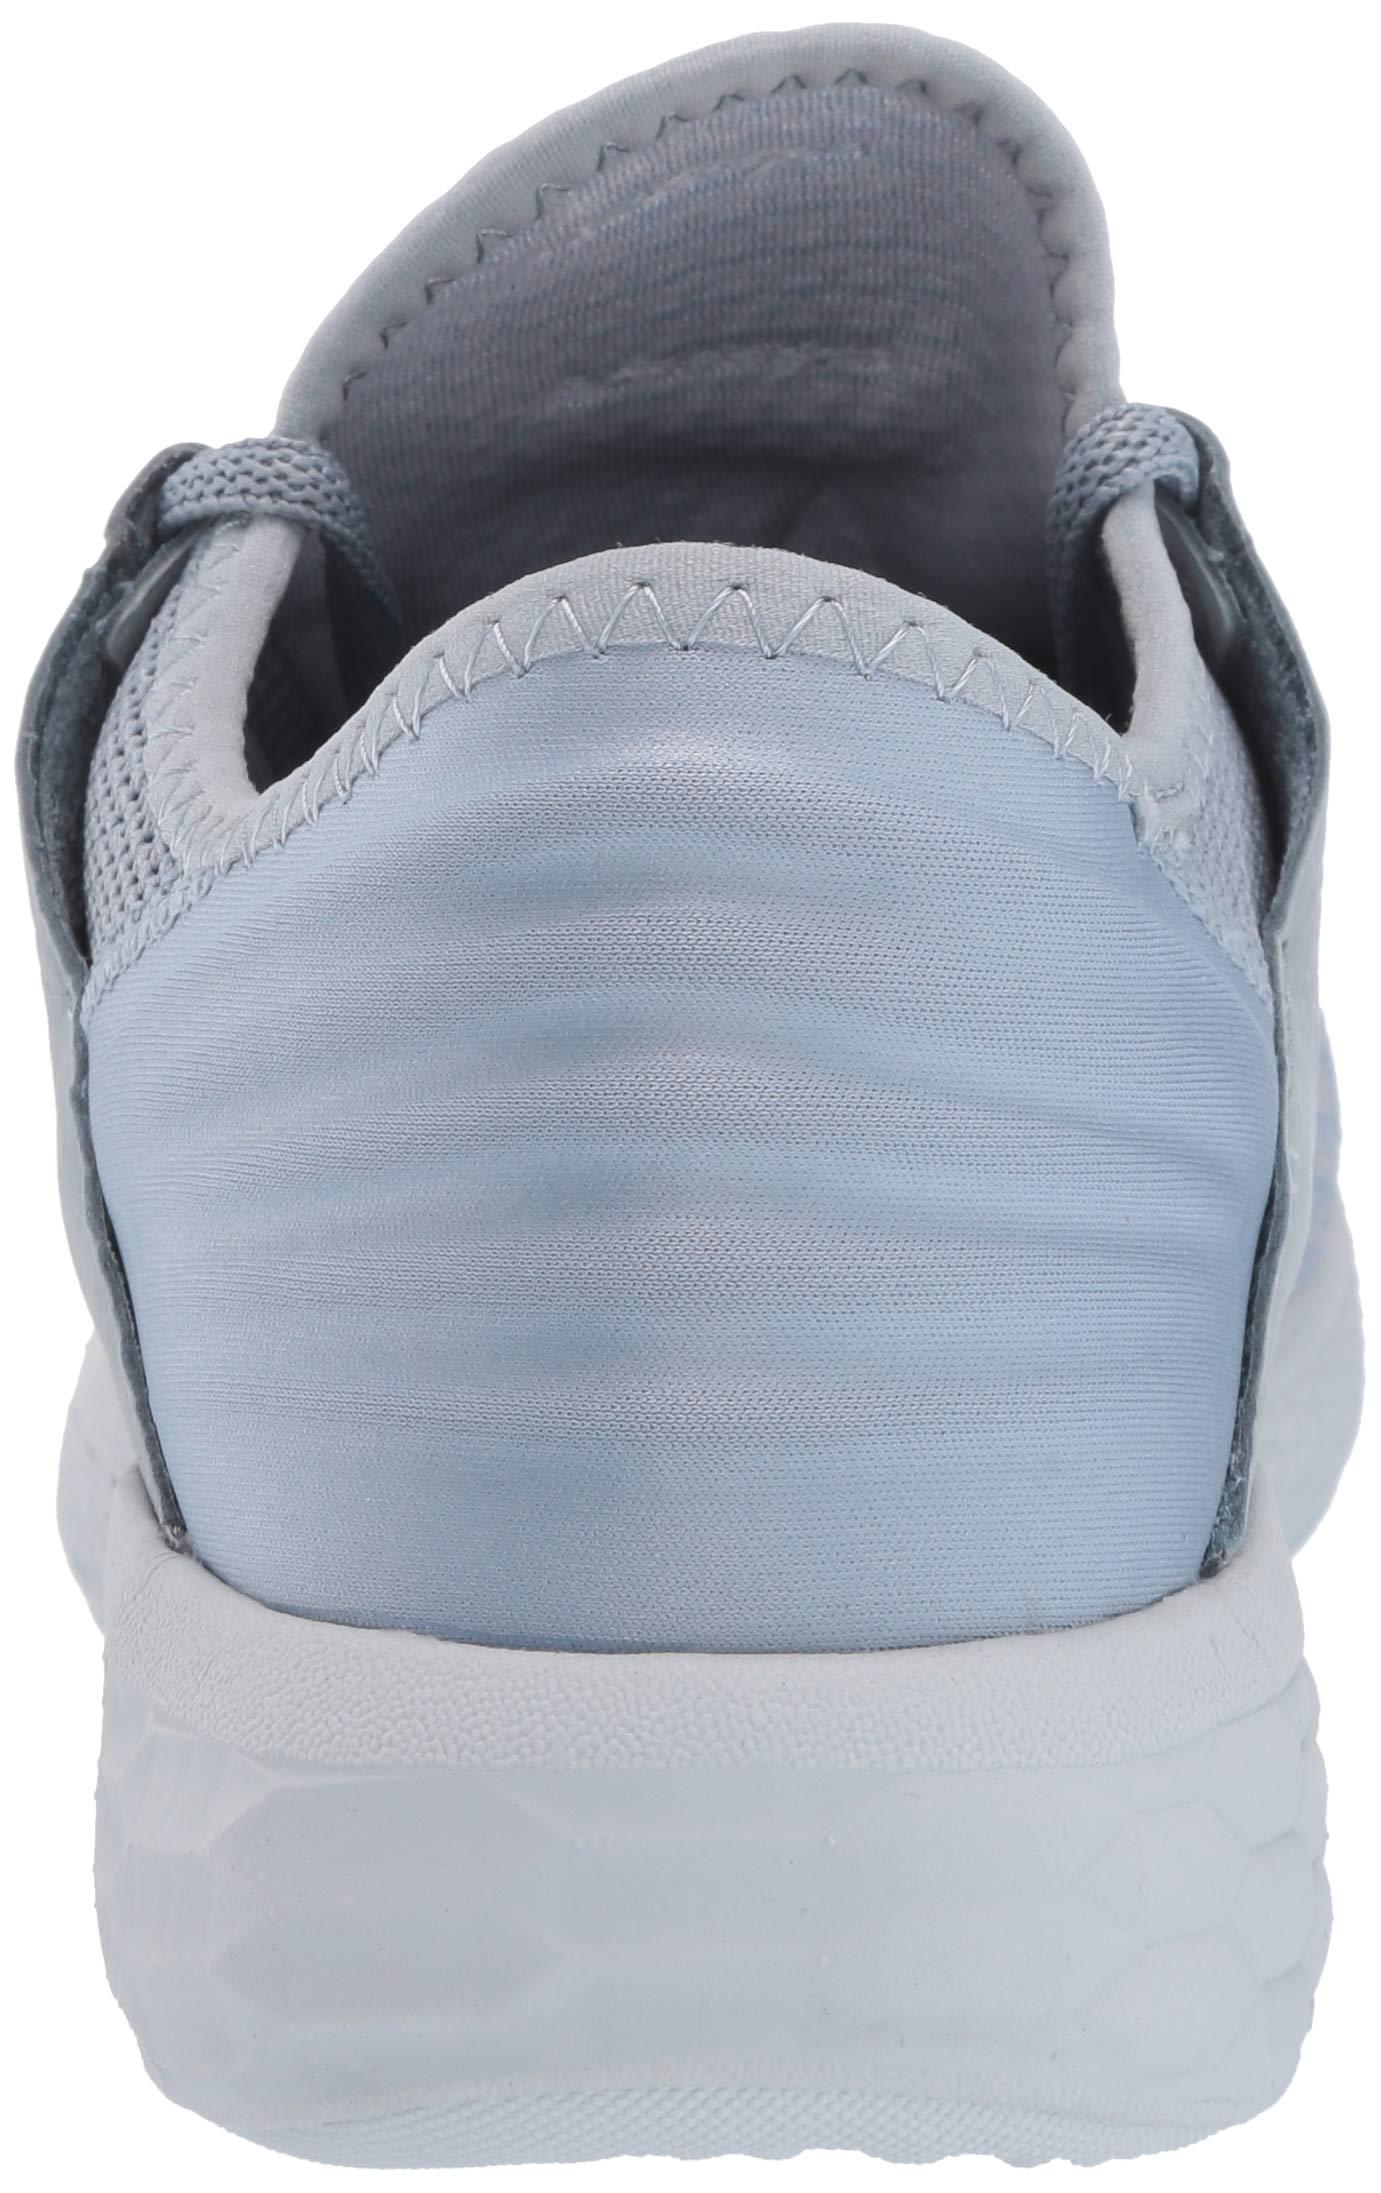 New Balance Women's Cruz V2 Fresh Foam Running Shoe, Reflection/Light Cyclone, 5 B US by New Balance (Image #2)